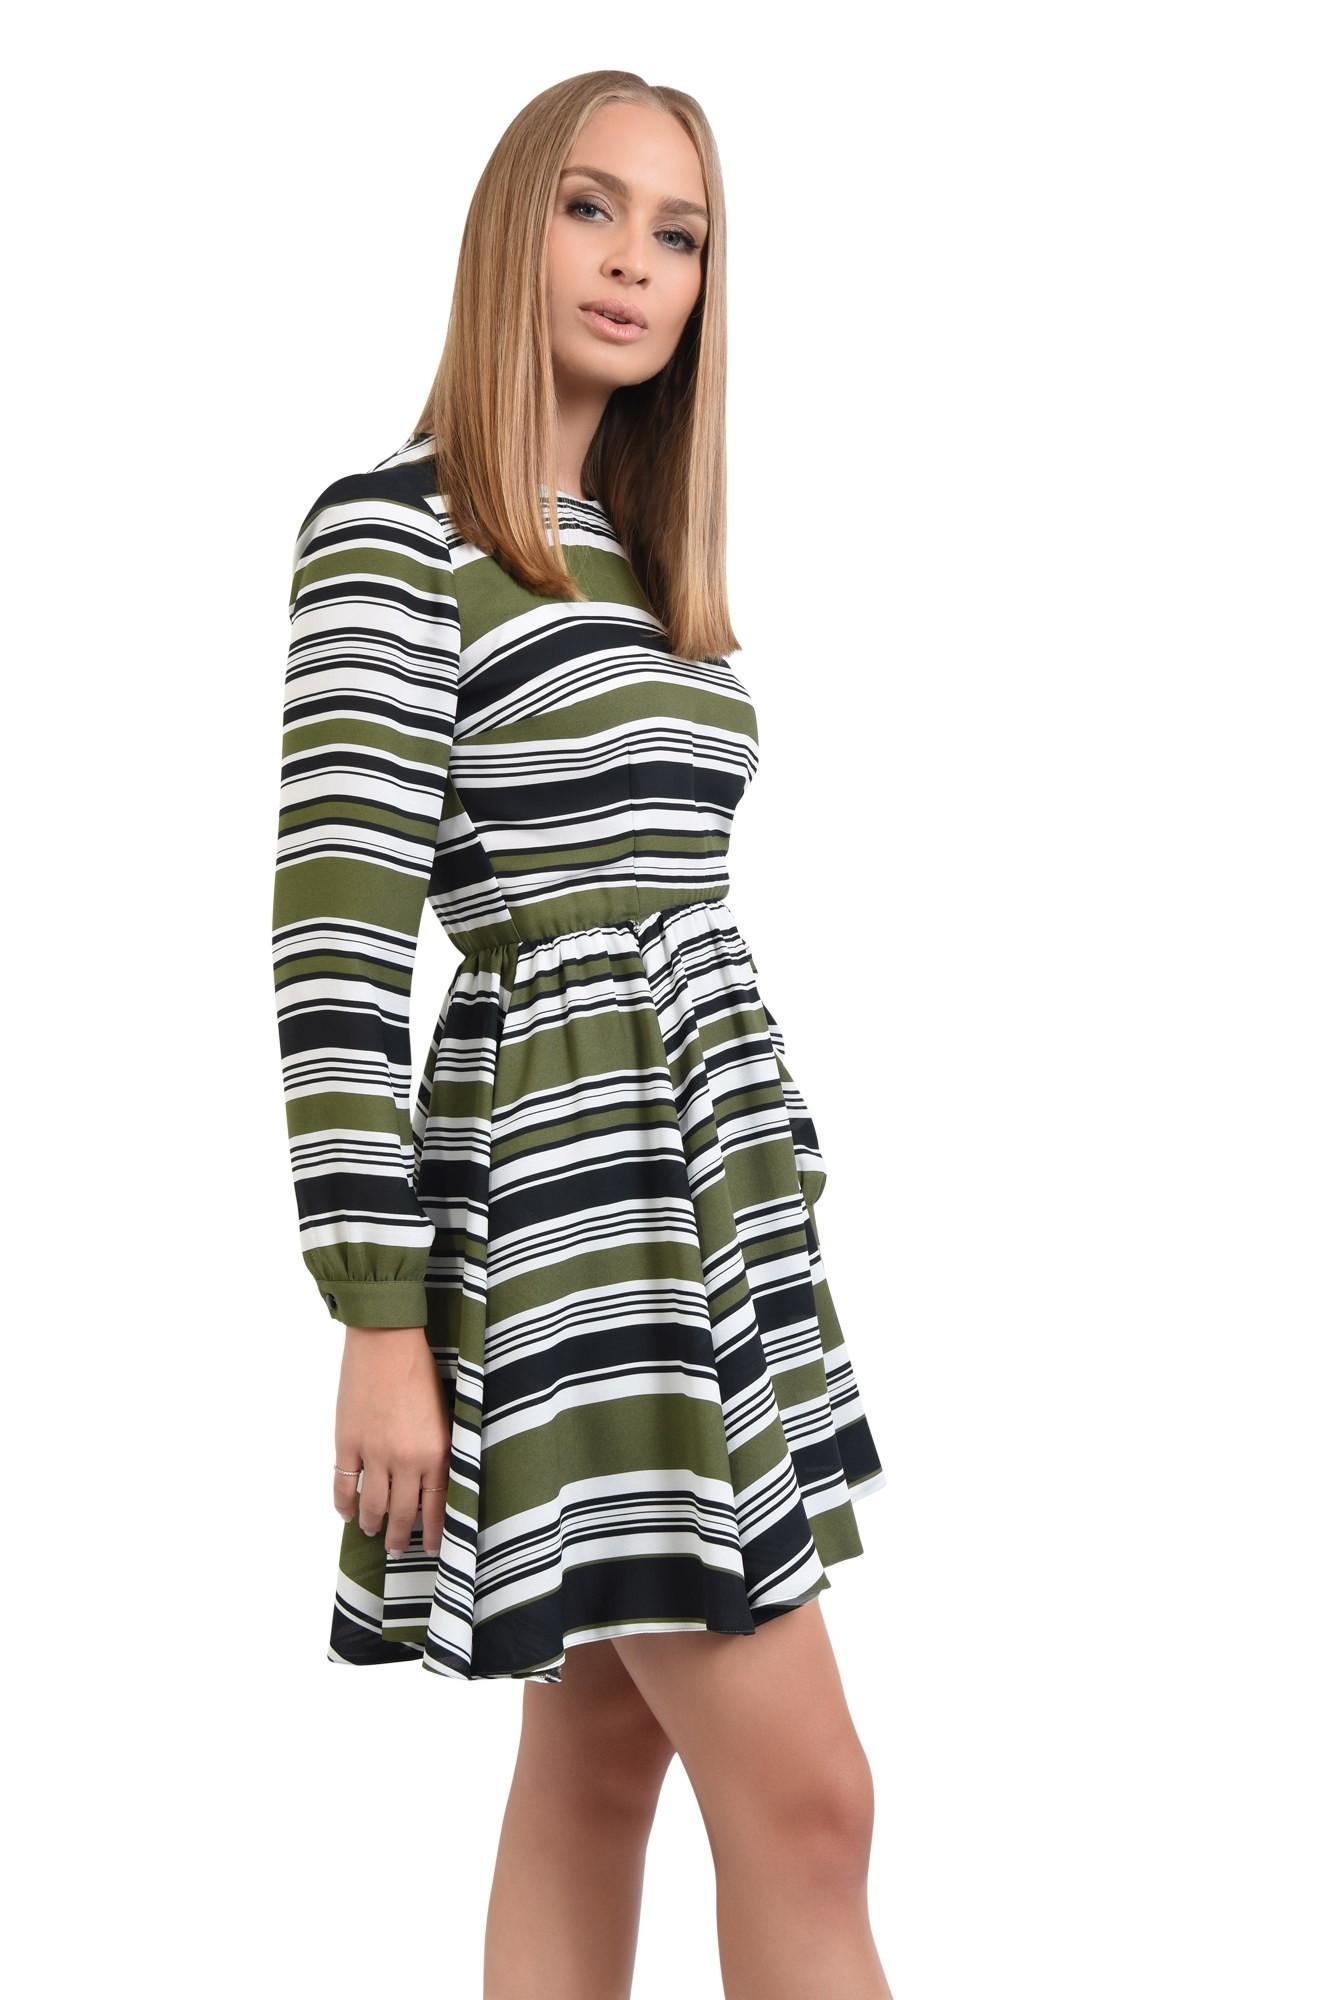 0 - rochie casual, talie pe elastic, decolteu rotund la baza gatului, rochii online